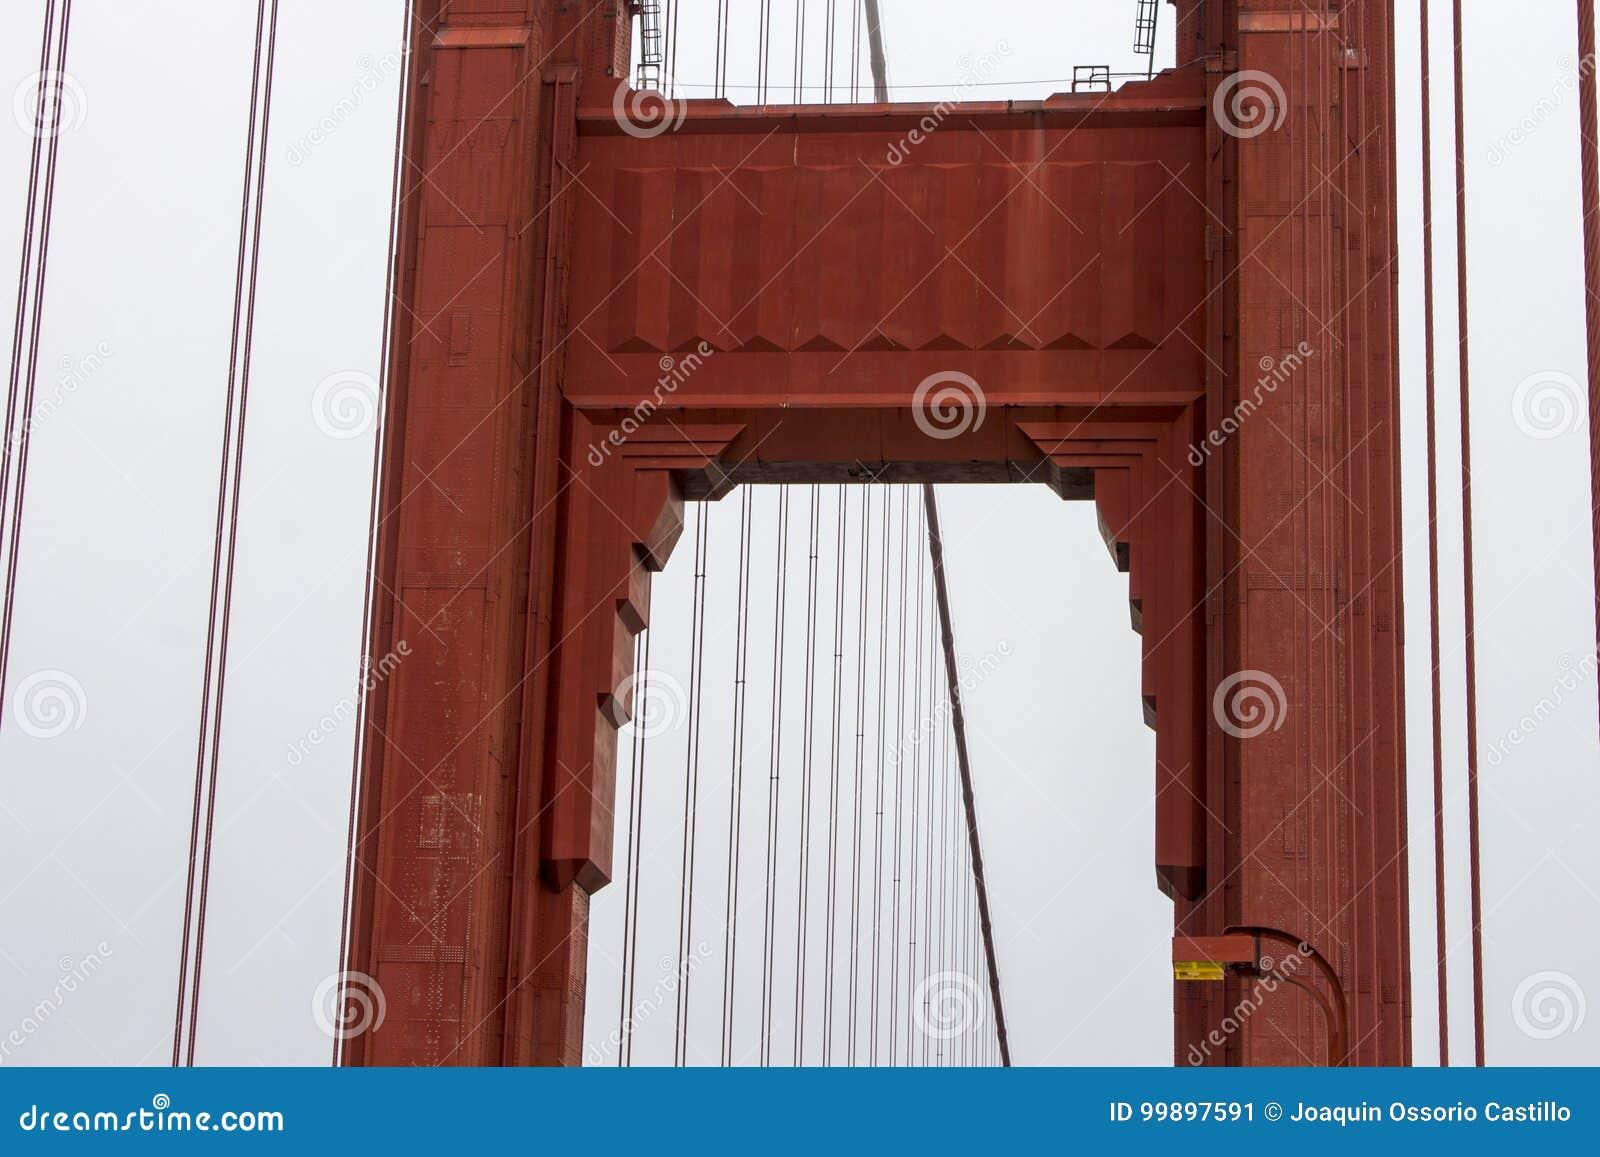 Ponticello di cancello dorato, San Francisco, California